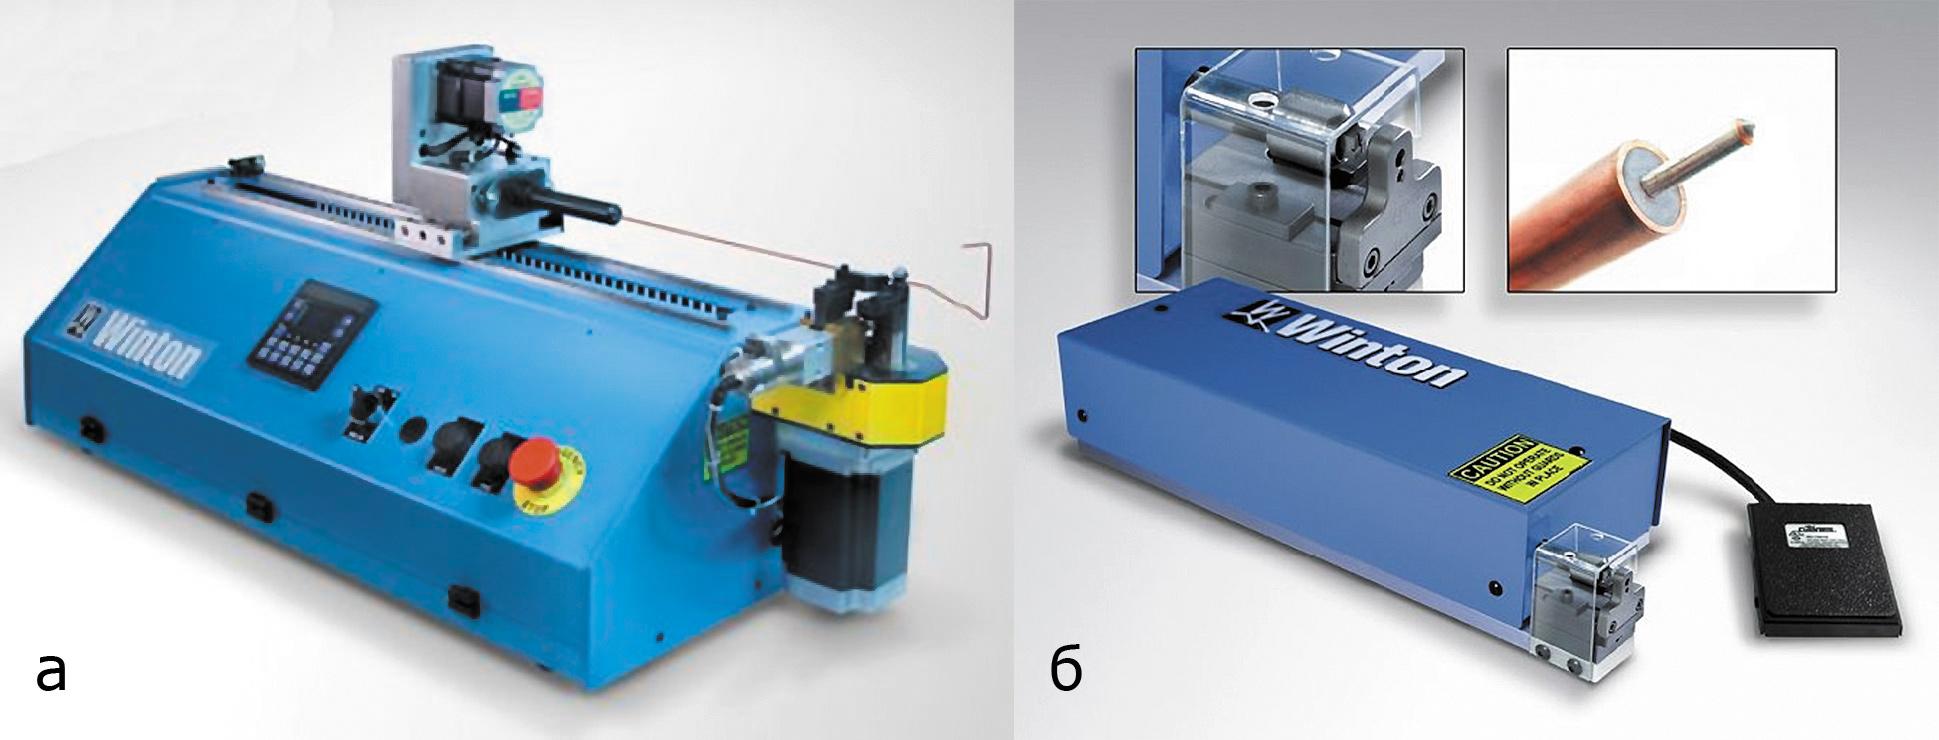 Рис. 9. Машины Winton: а) гибки жестких кабелей Winton Machine CX-6; б) изготовления фаски Winton Machine Pointer